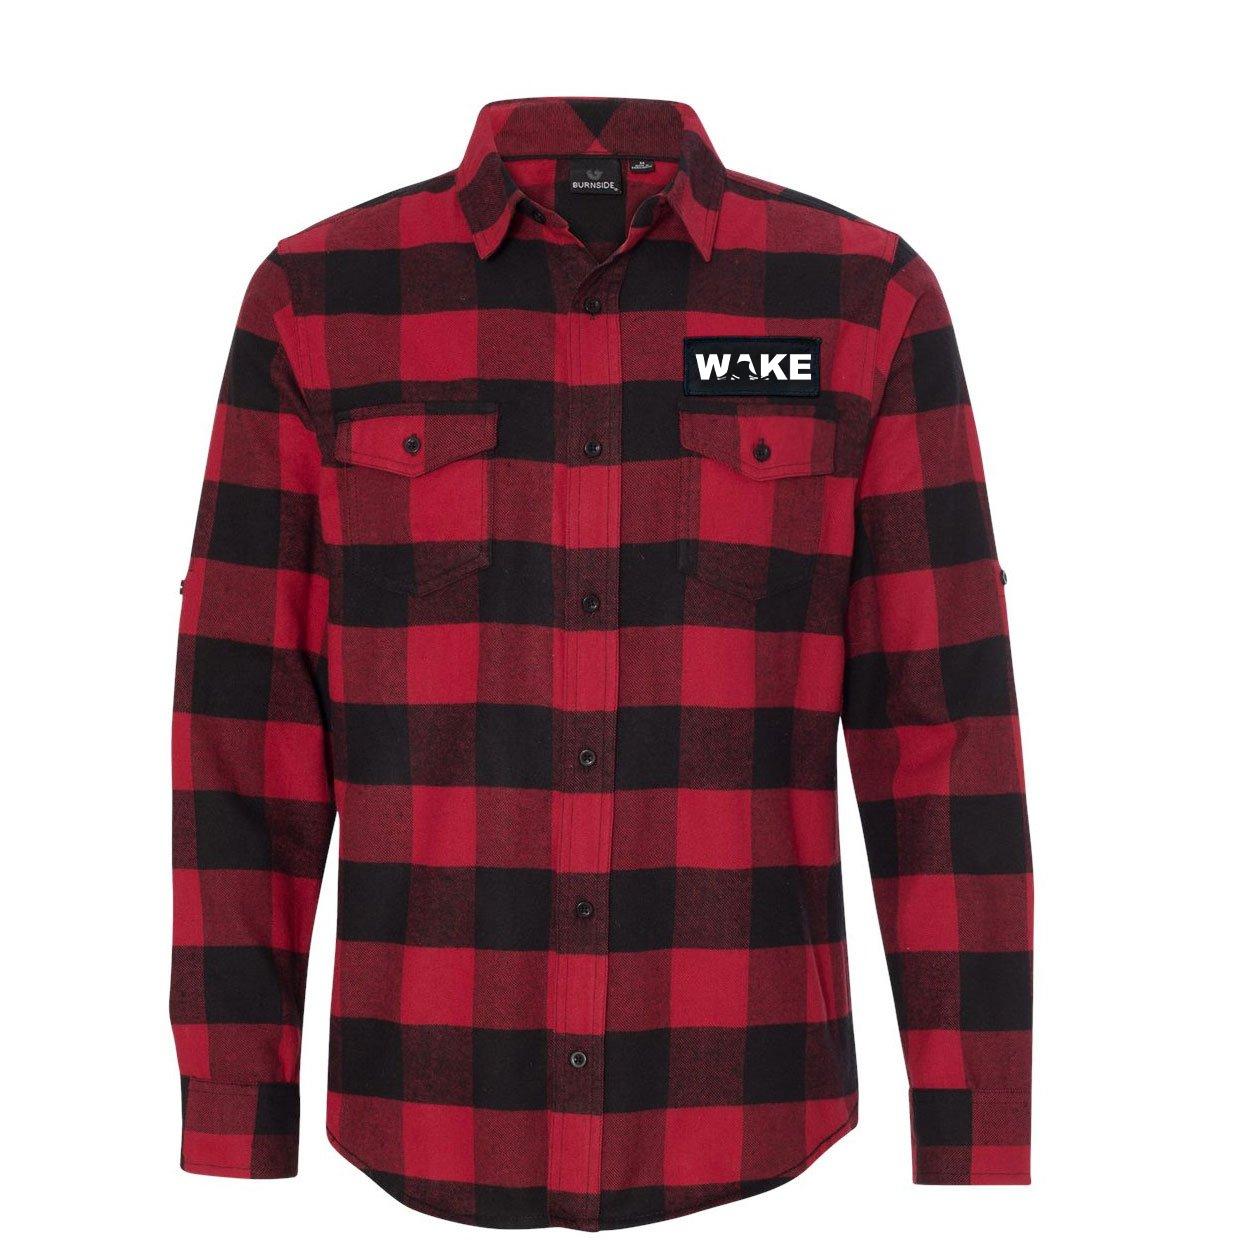 Wake Wave Logo Classic Unisex Long Sleeve Woven Patch Flannel Shirt Red/Black Buffalo (White Logo)